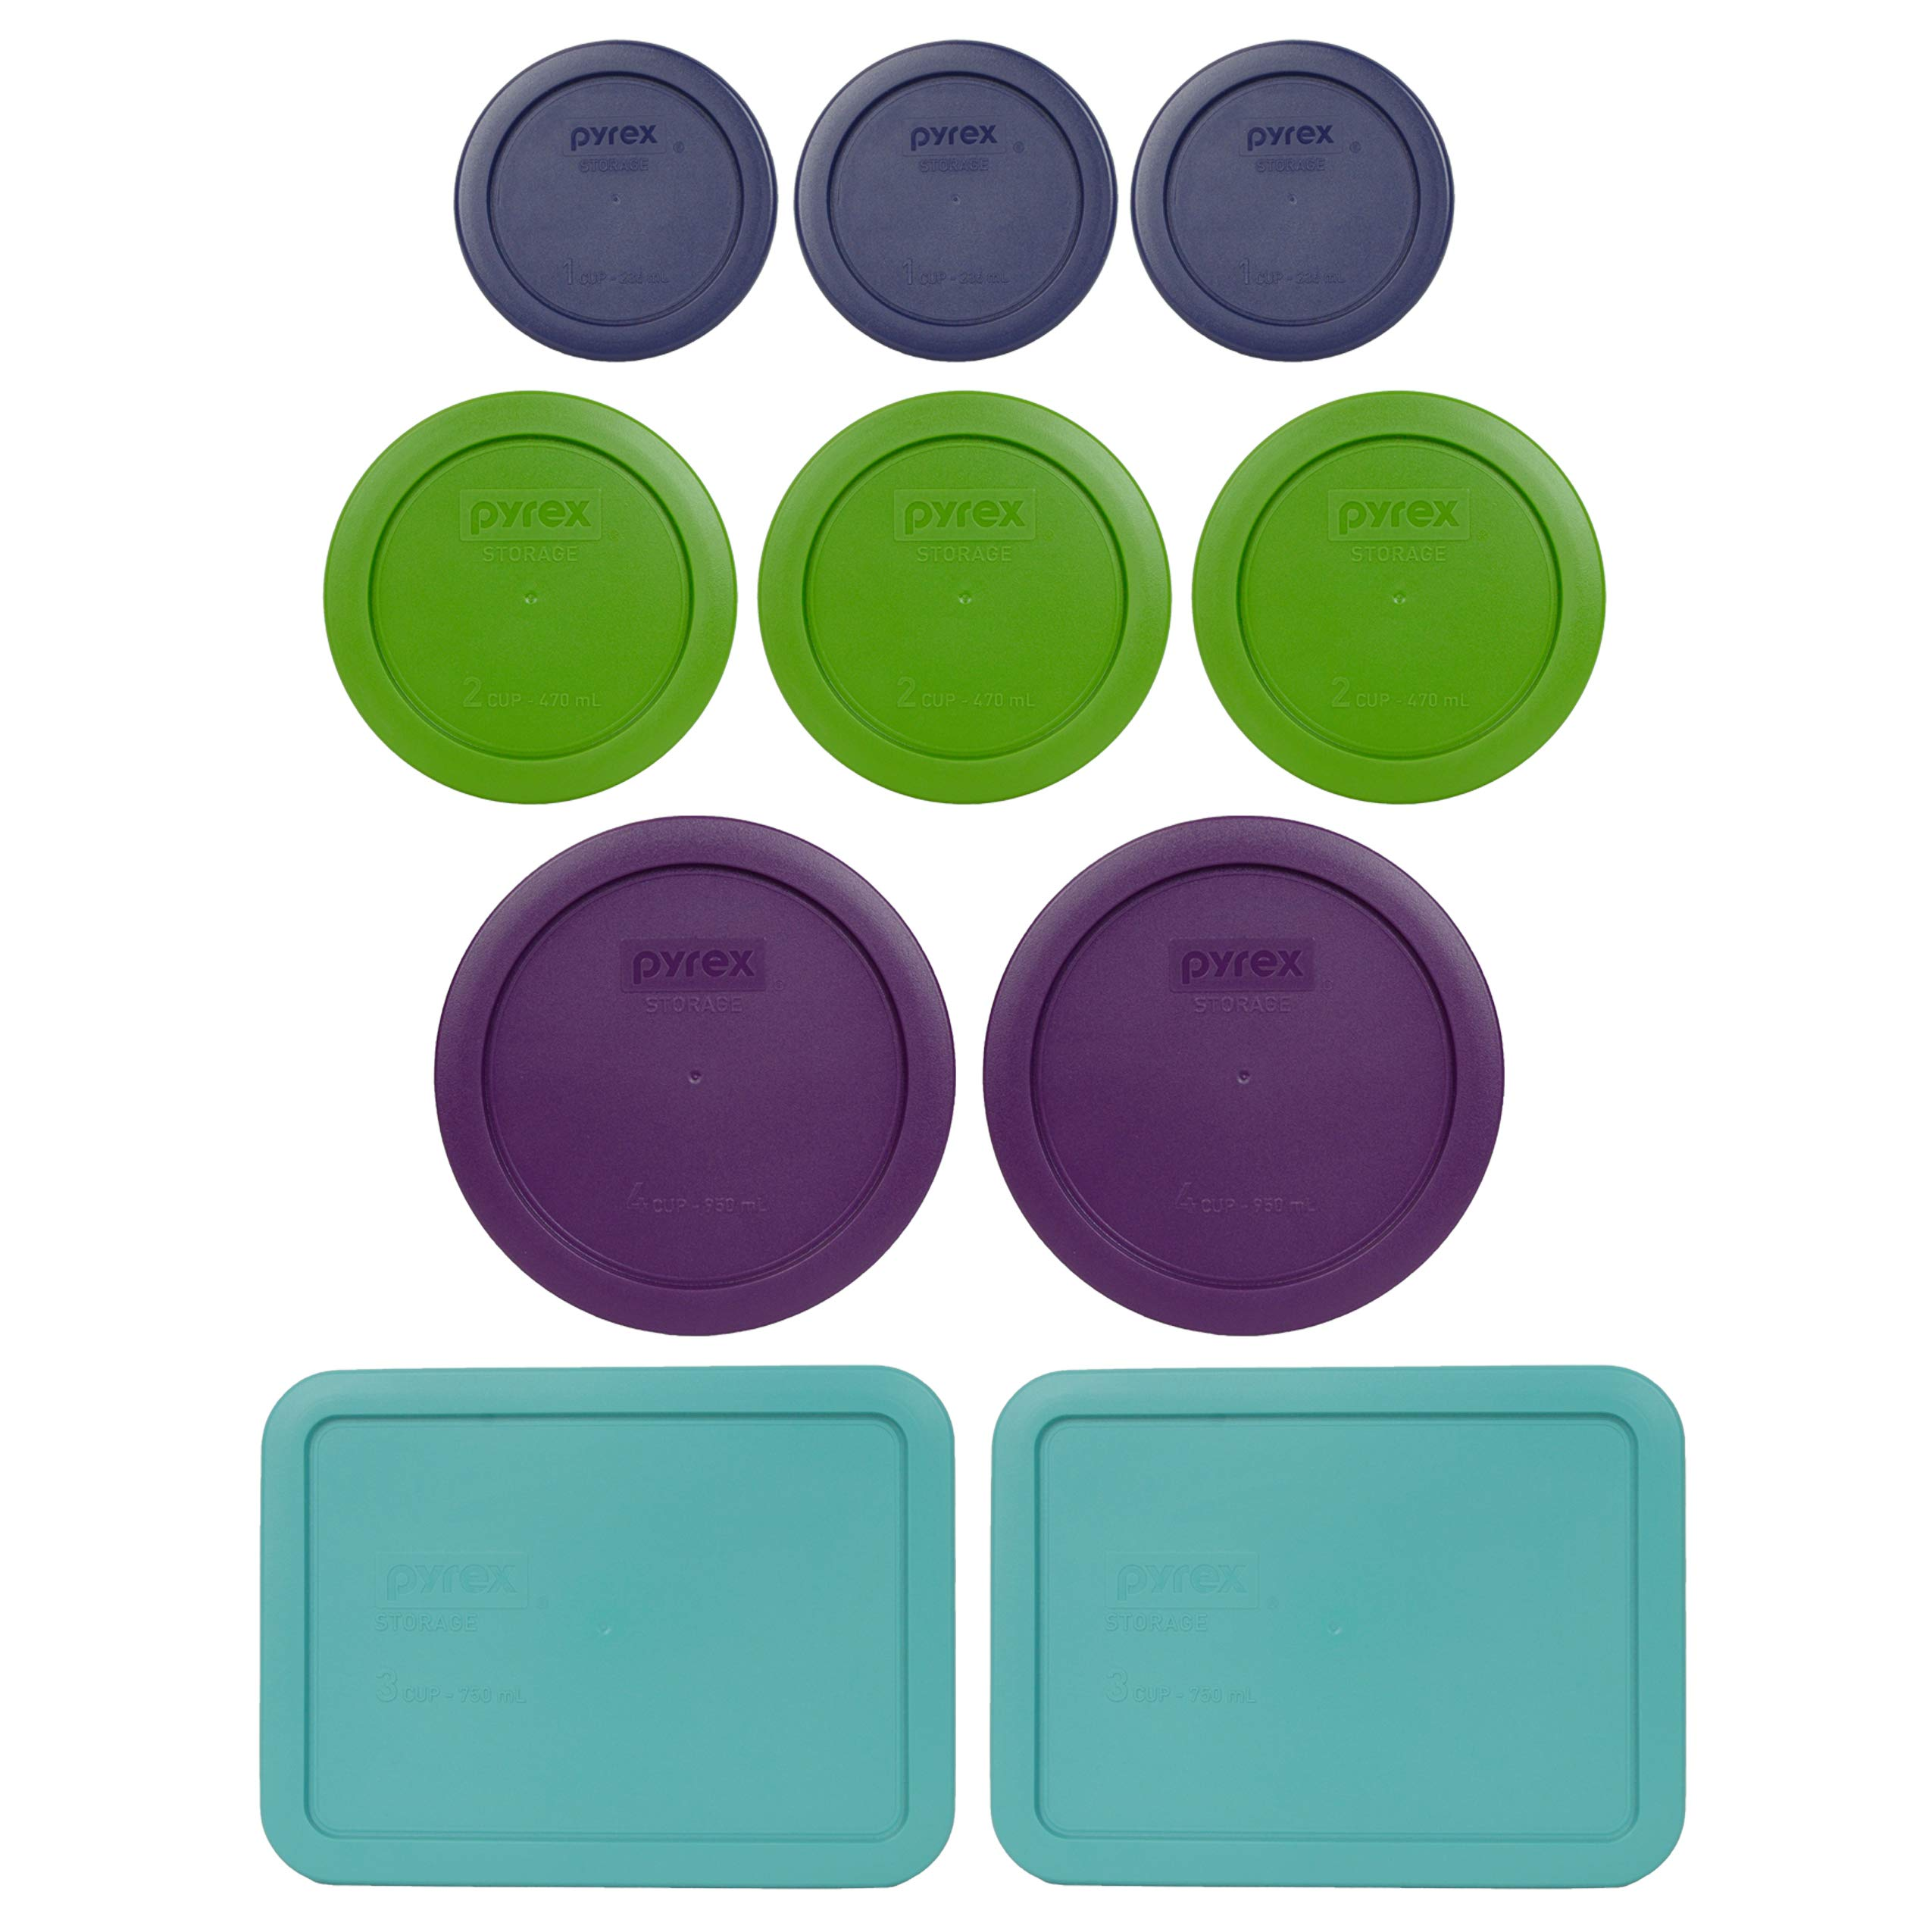 Pyrex Simply Store Storage Set (Replacement lids for 20-piece set (10 lids) by Pyrex